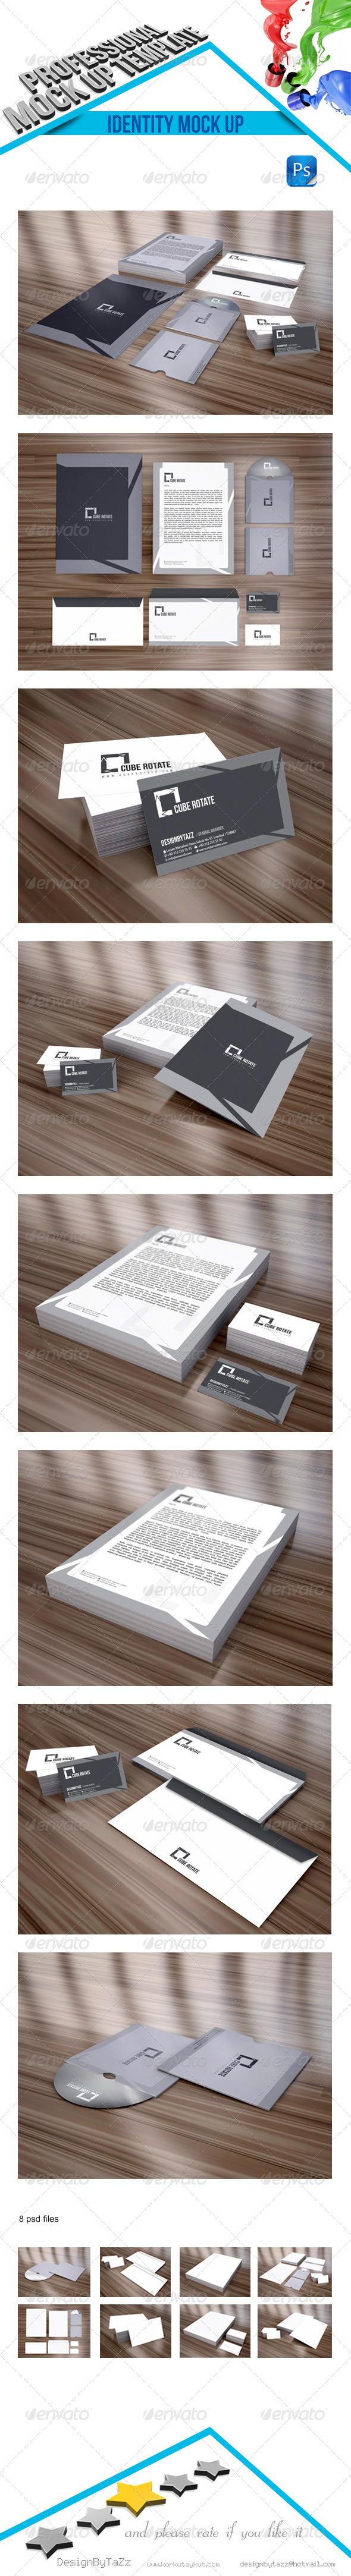 GraphicRiver Stationery Branding Mock-Up v2 4542155